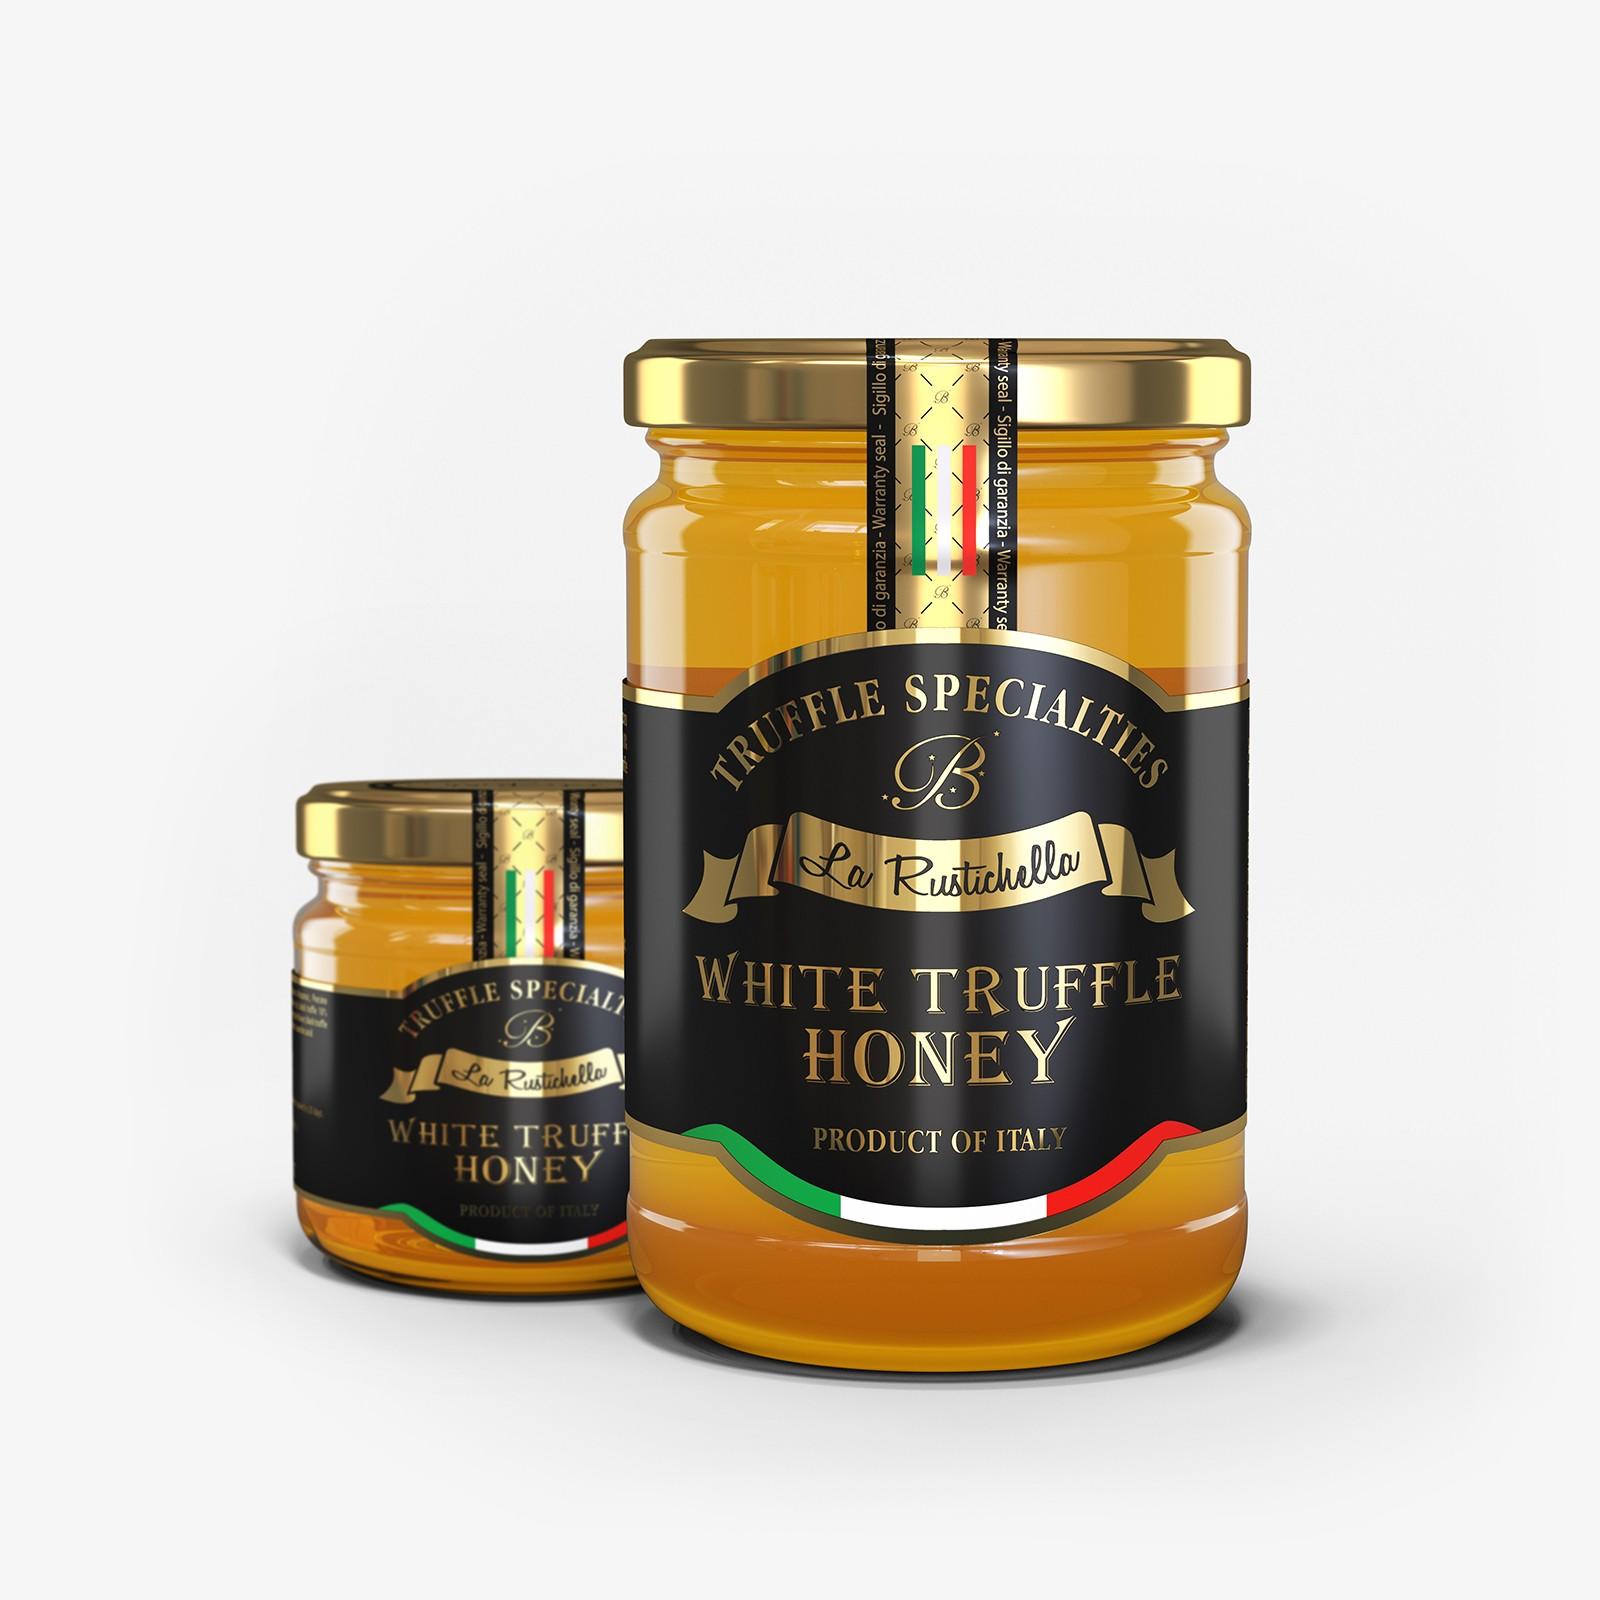 Miele al tartufo bianco